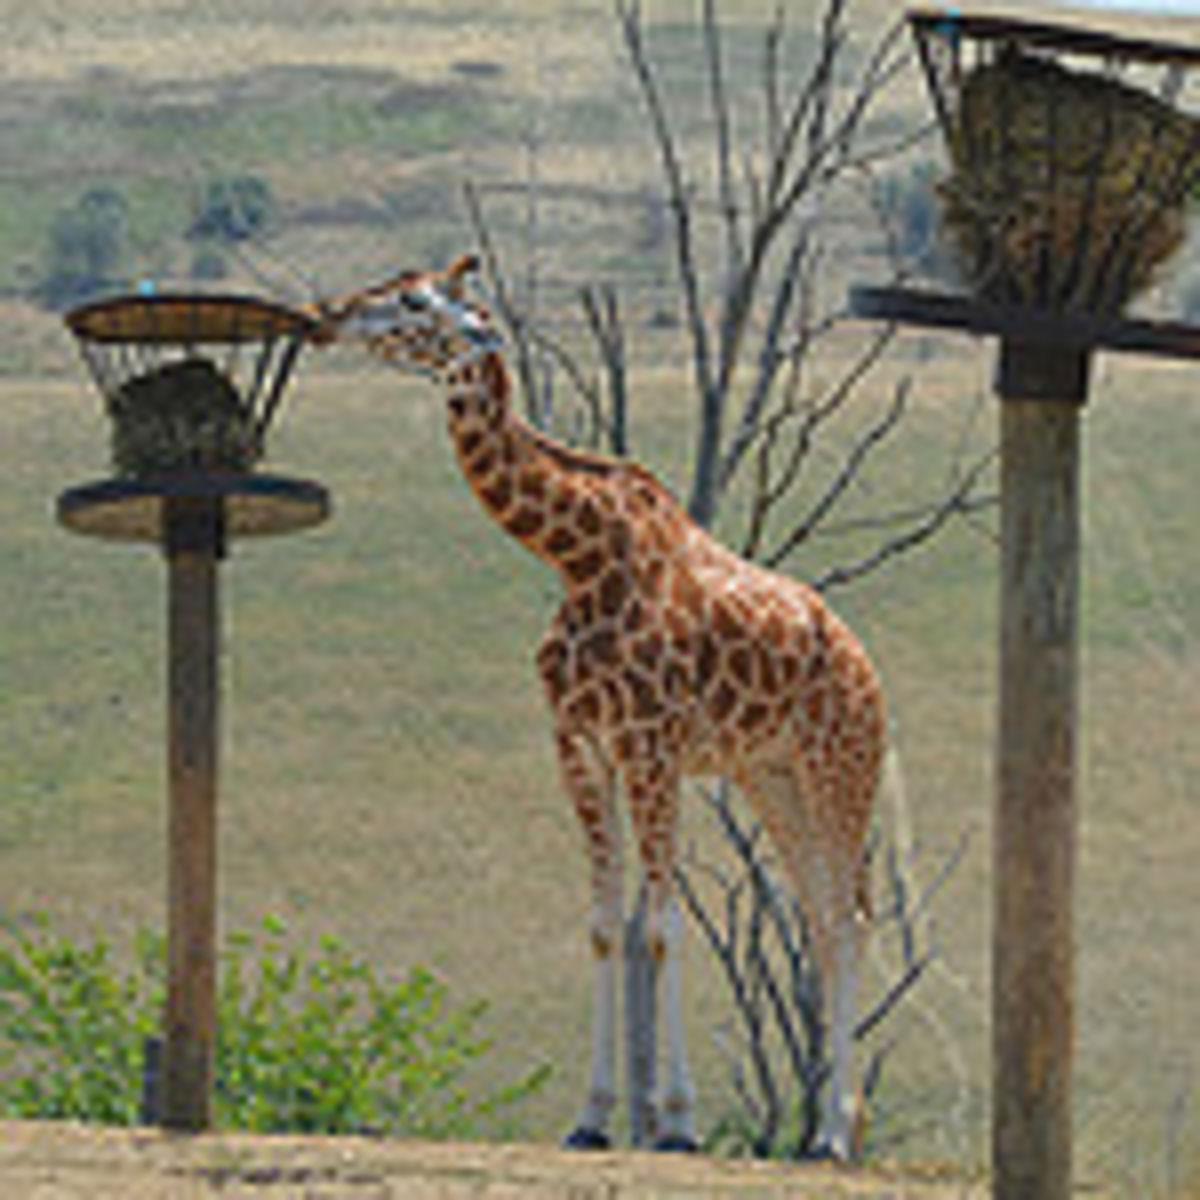 Don't Describe the Flashlight—Just Draw the Giraffe